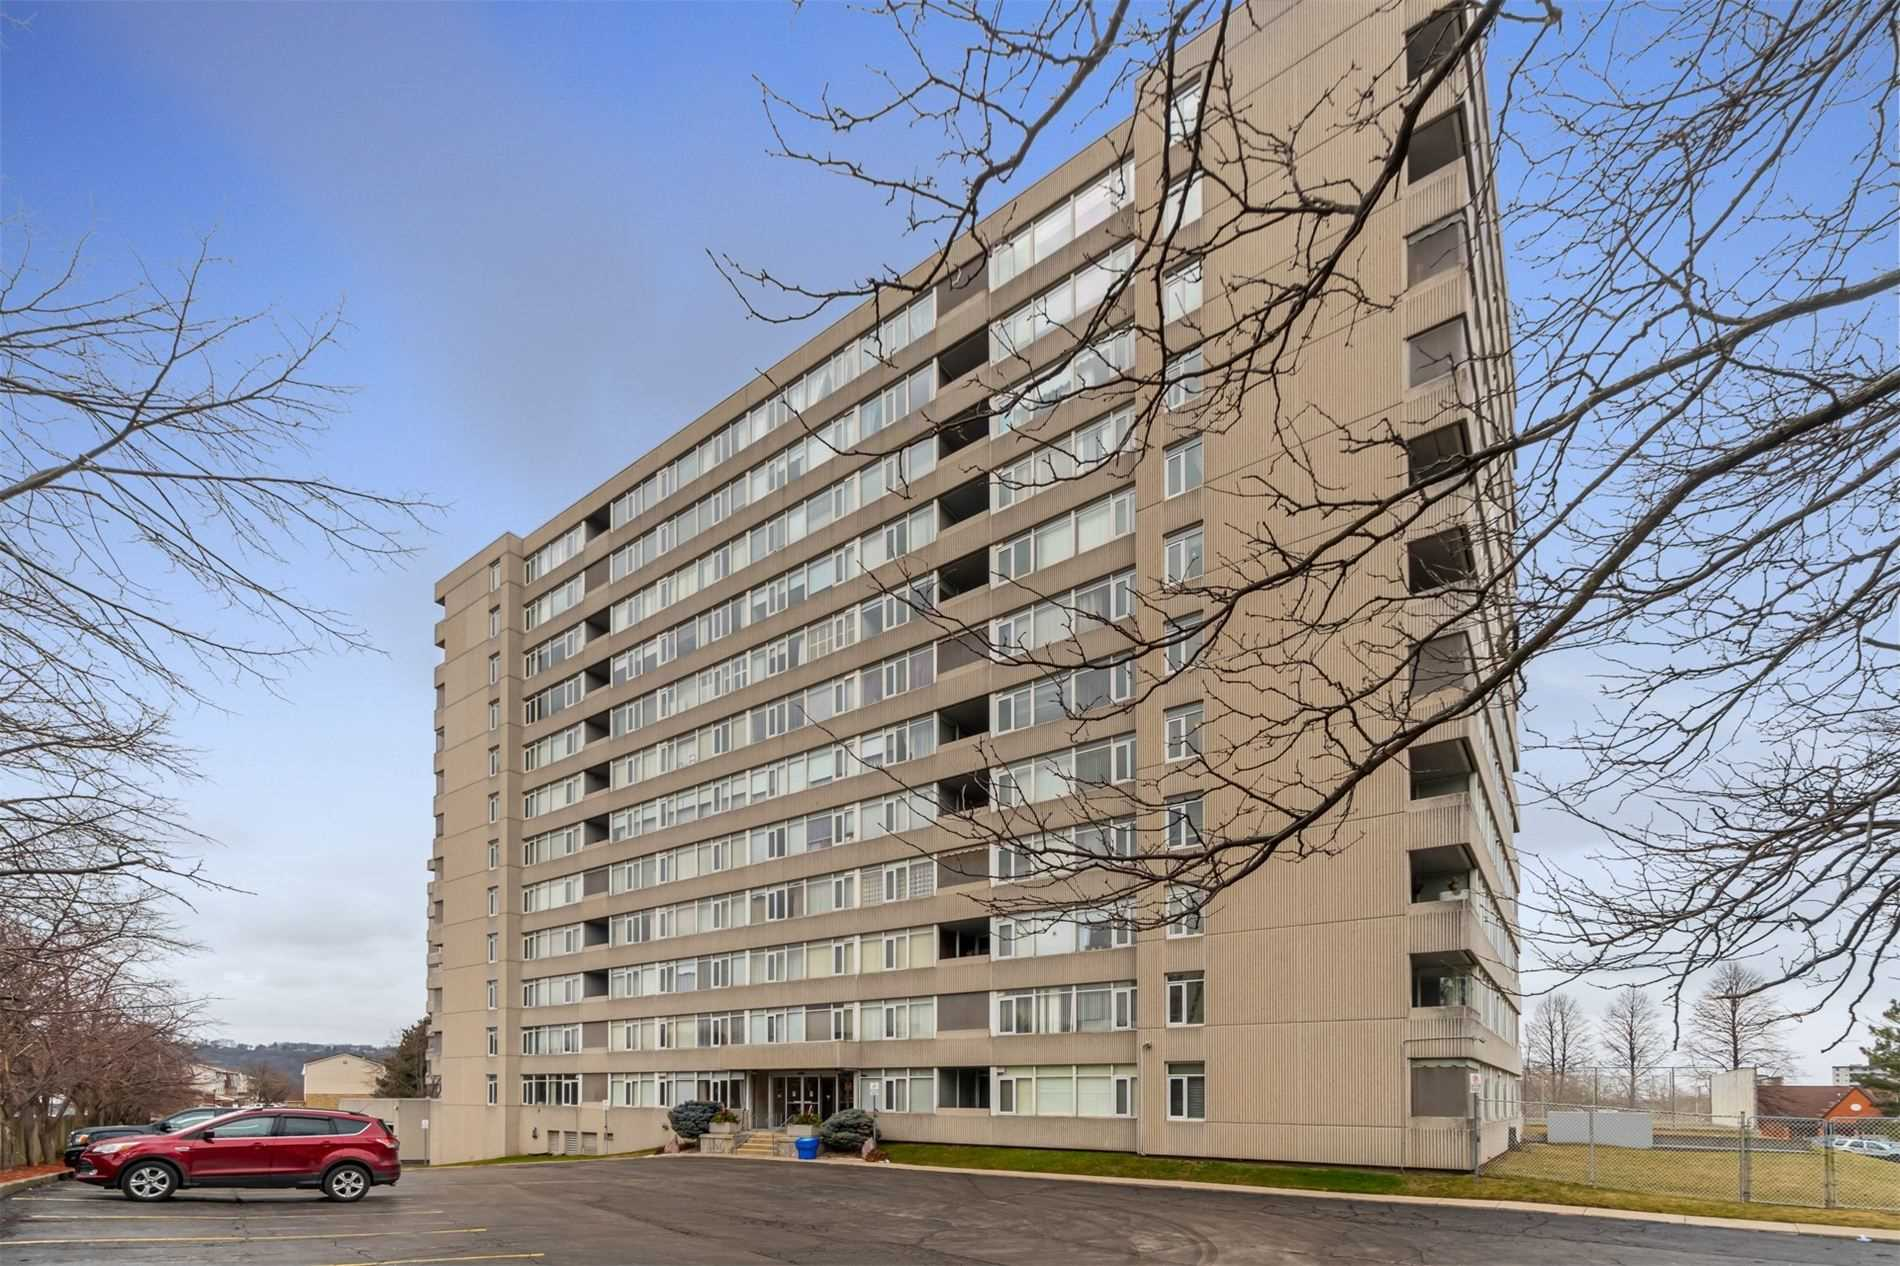 40 Harrisford St, Hamilton